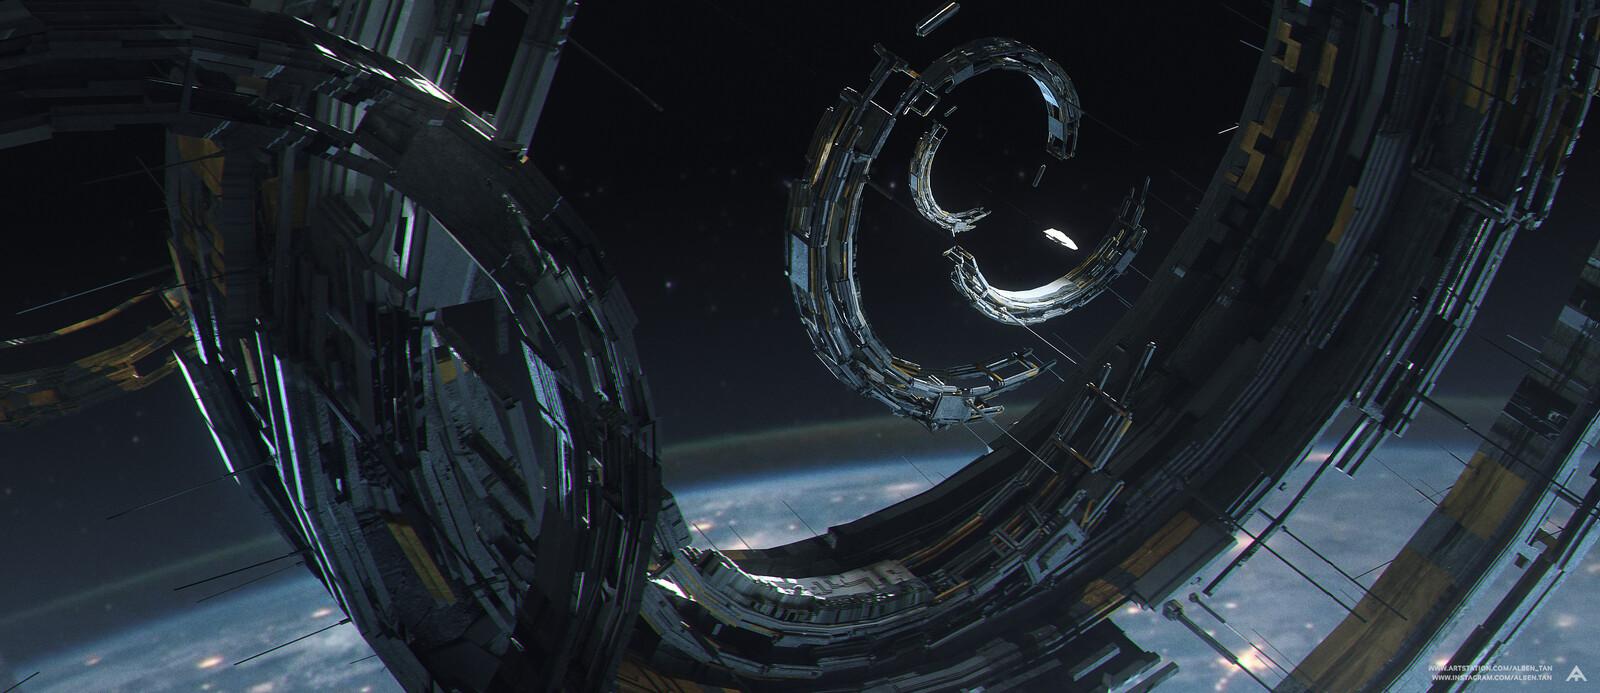 Space.exe